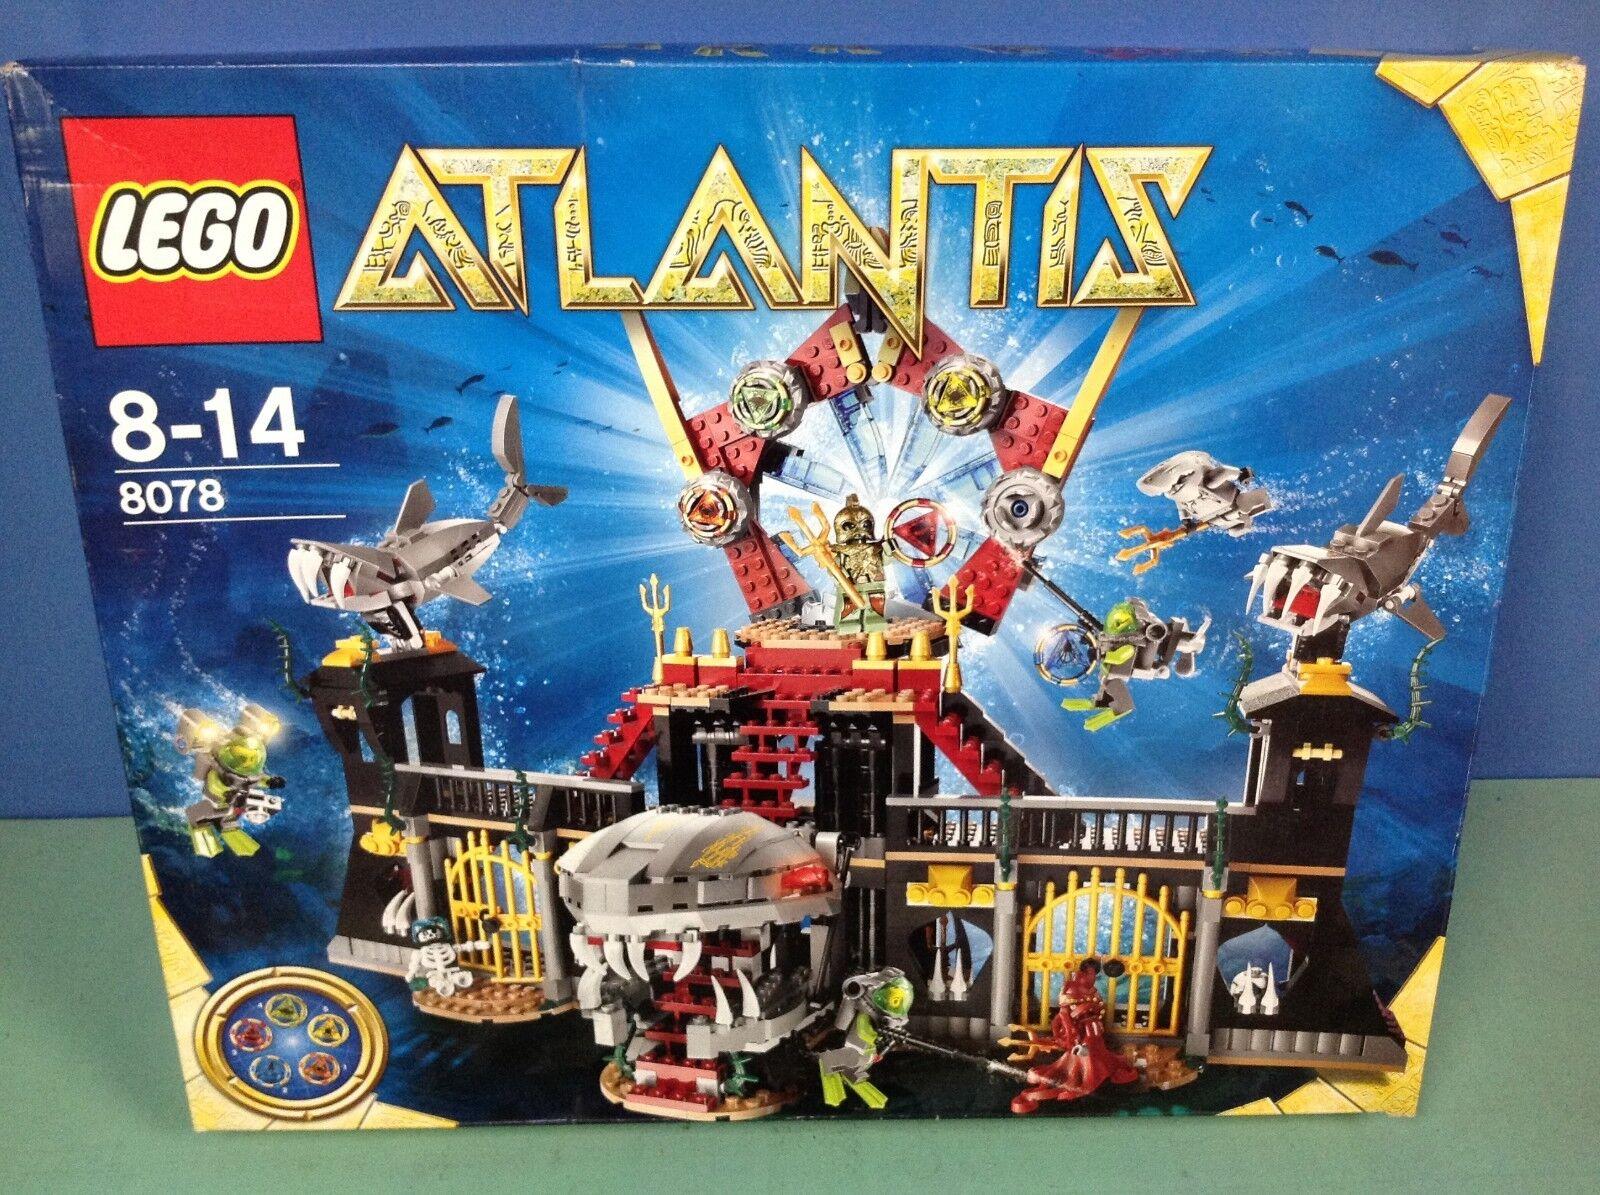 (N8078) Légo grande base Atlantis 8-14 ans en boite neuve ref 8078